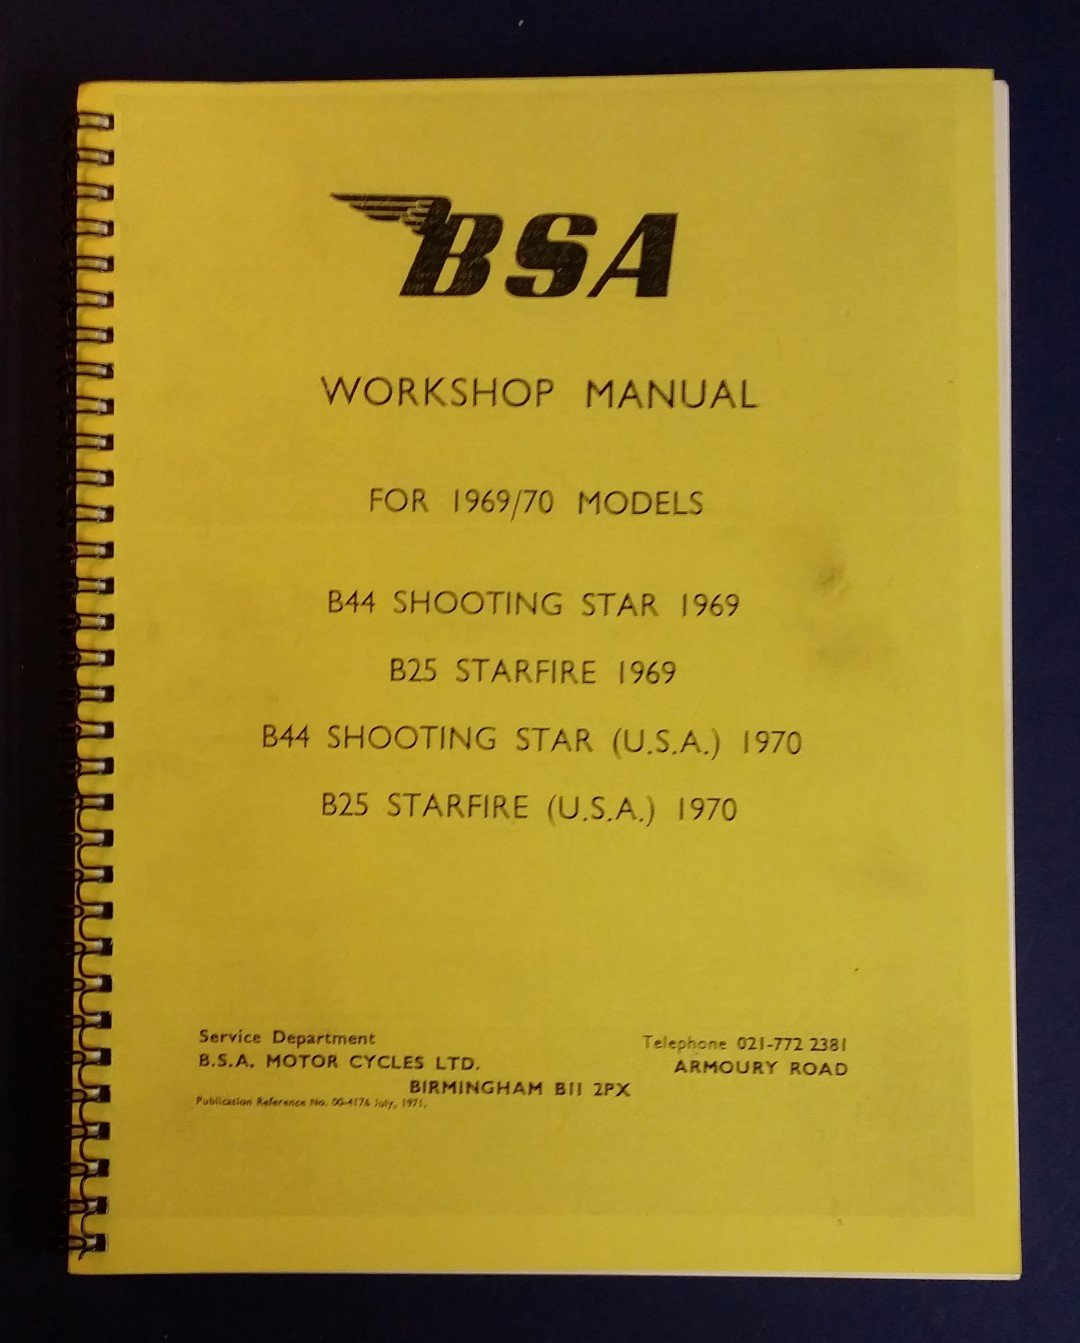 bsa c11 workshop manual pdf